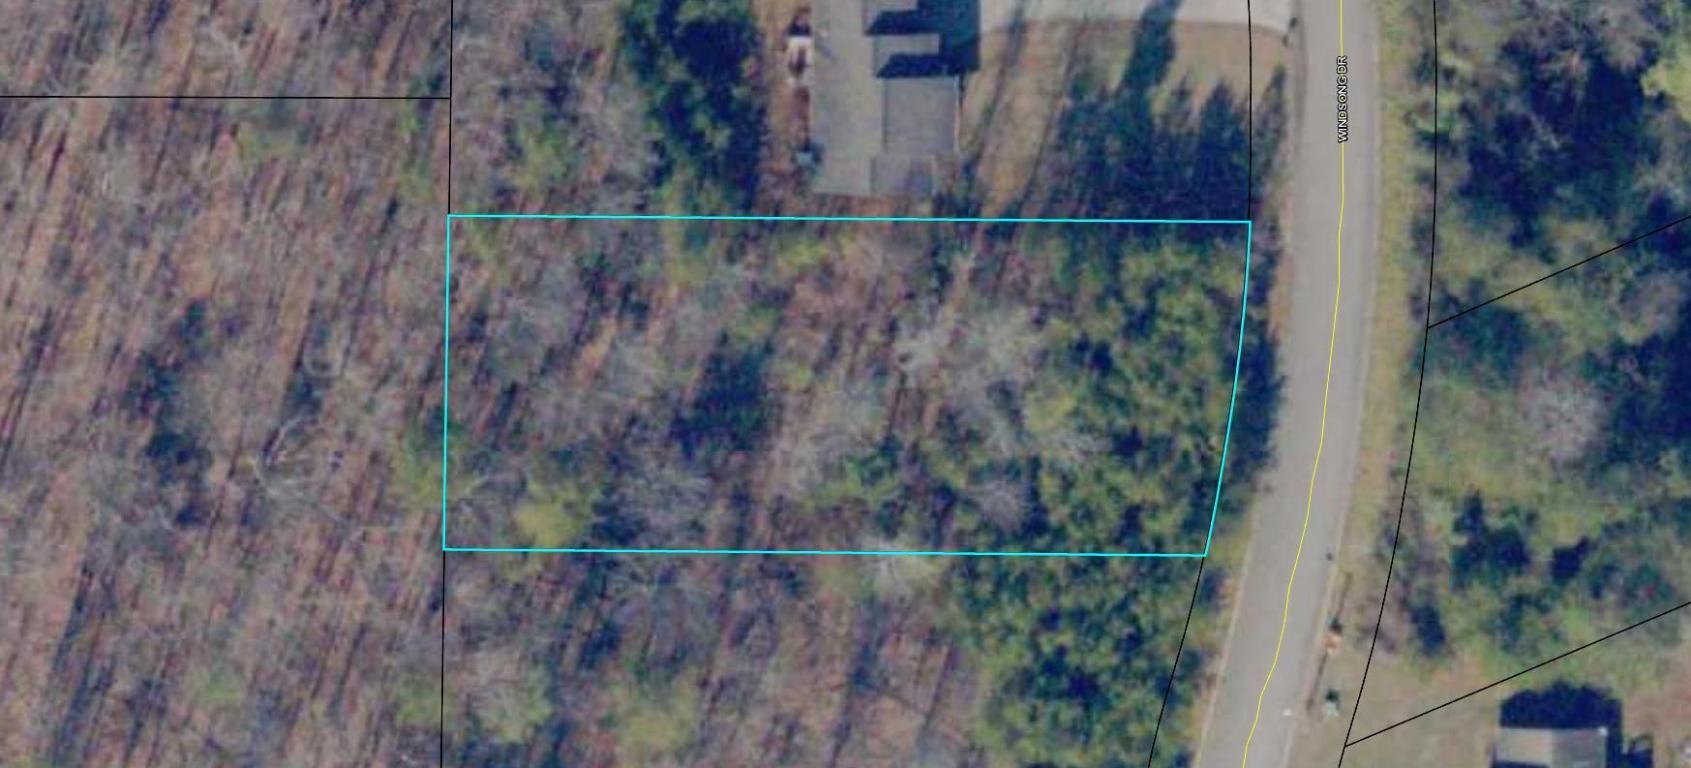 309 Windsong Dr, Lafayette, GA 30728